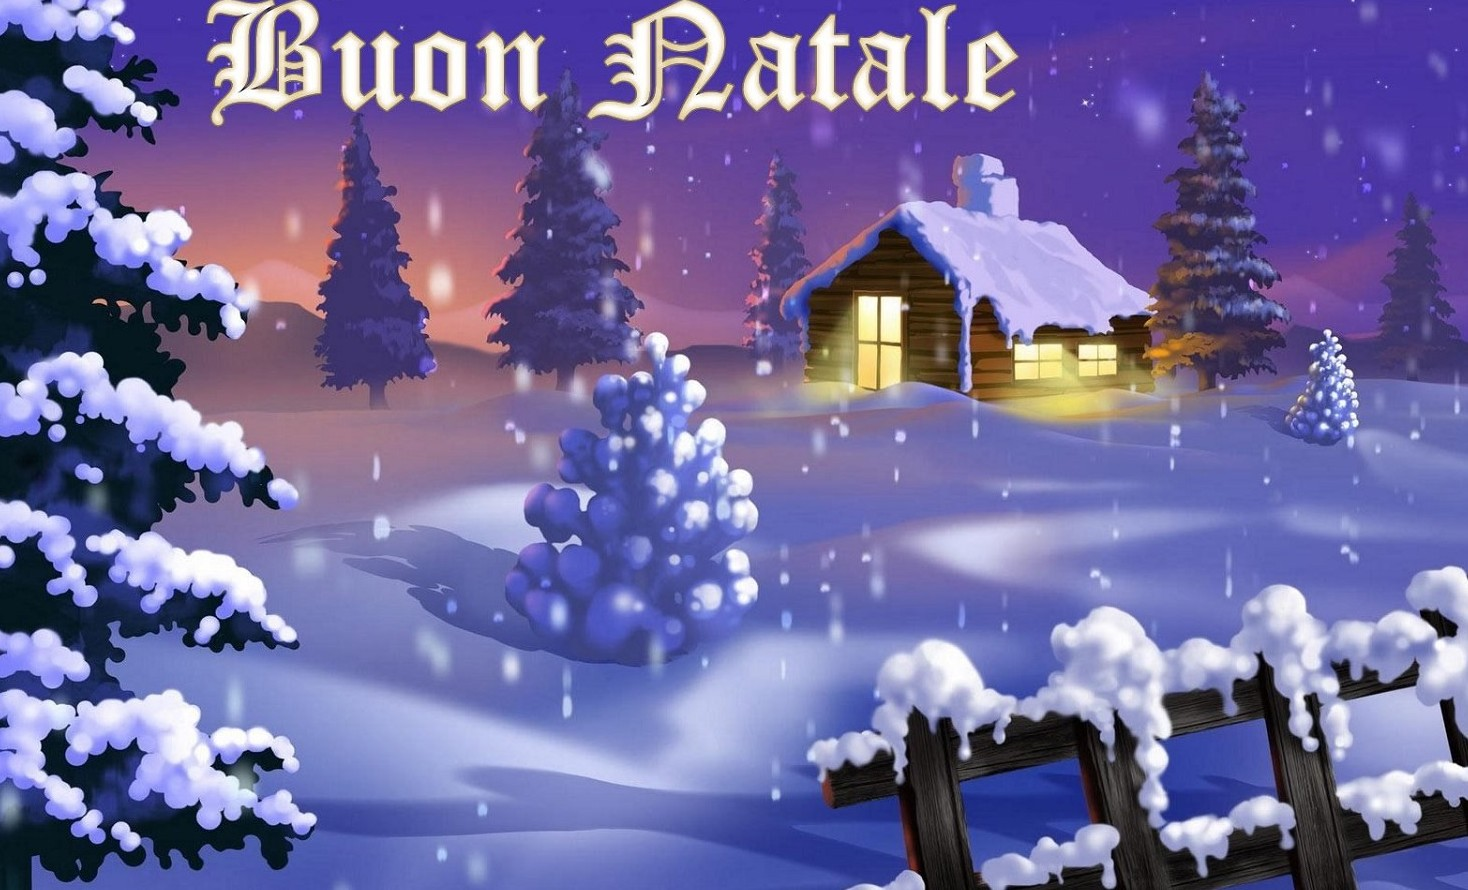 Frasi Auguri di Natale e Frasi Buone Fes